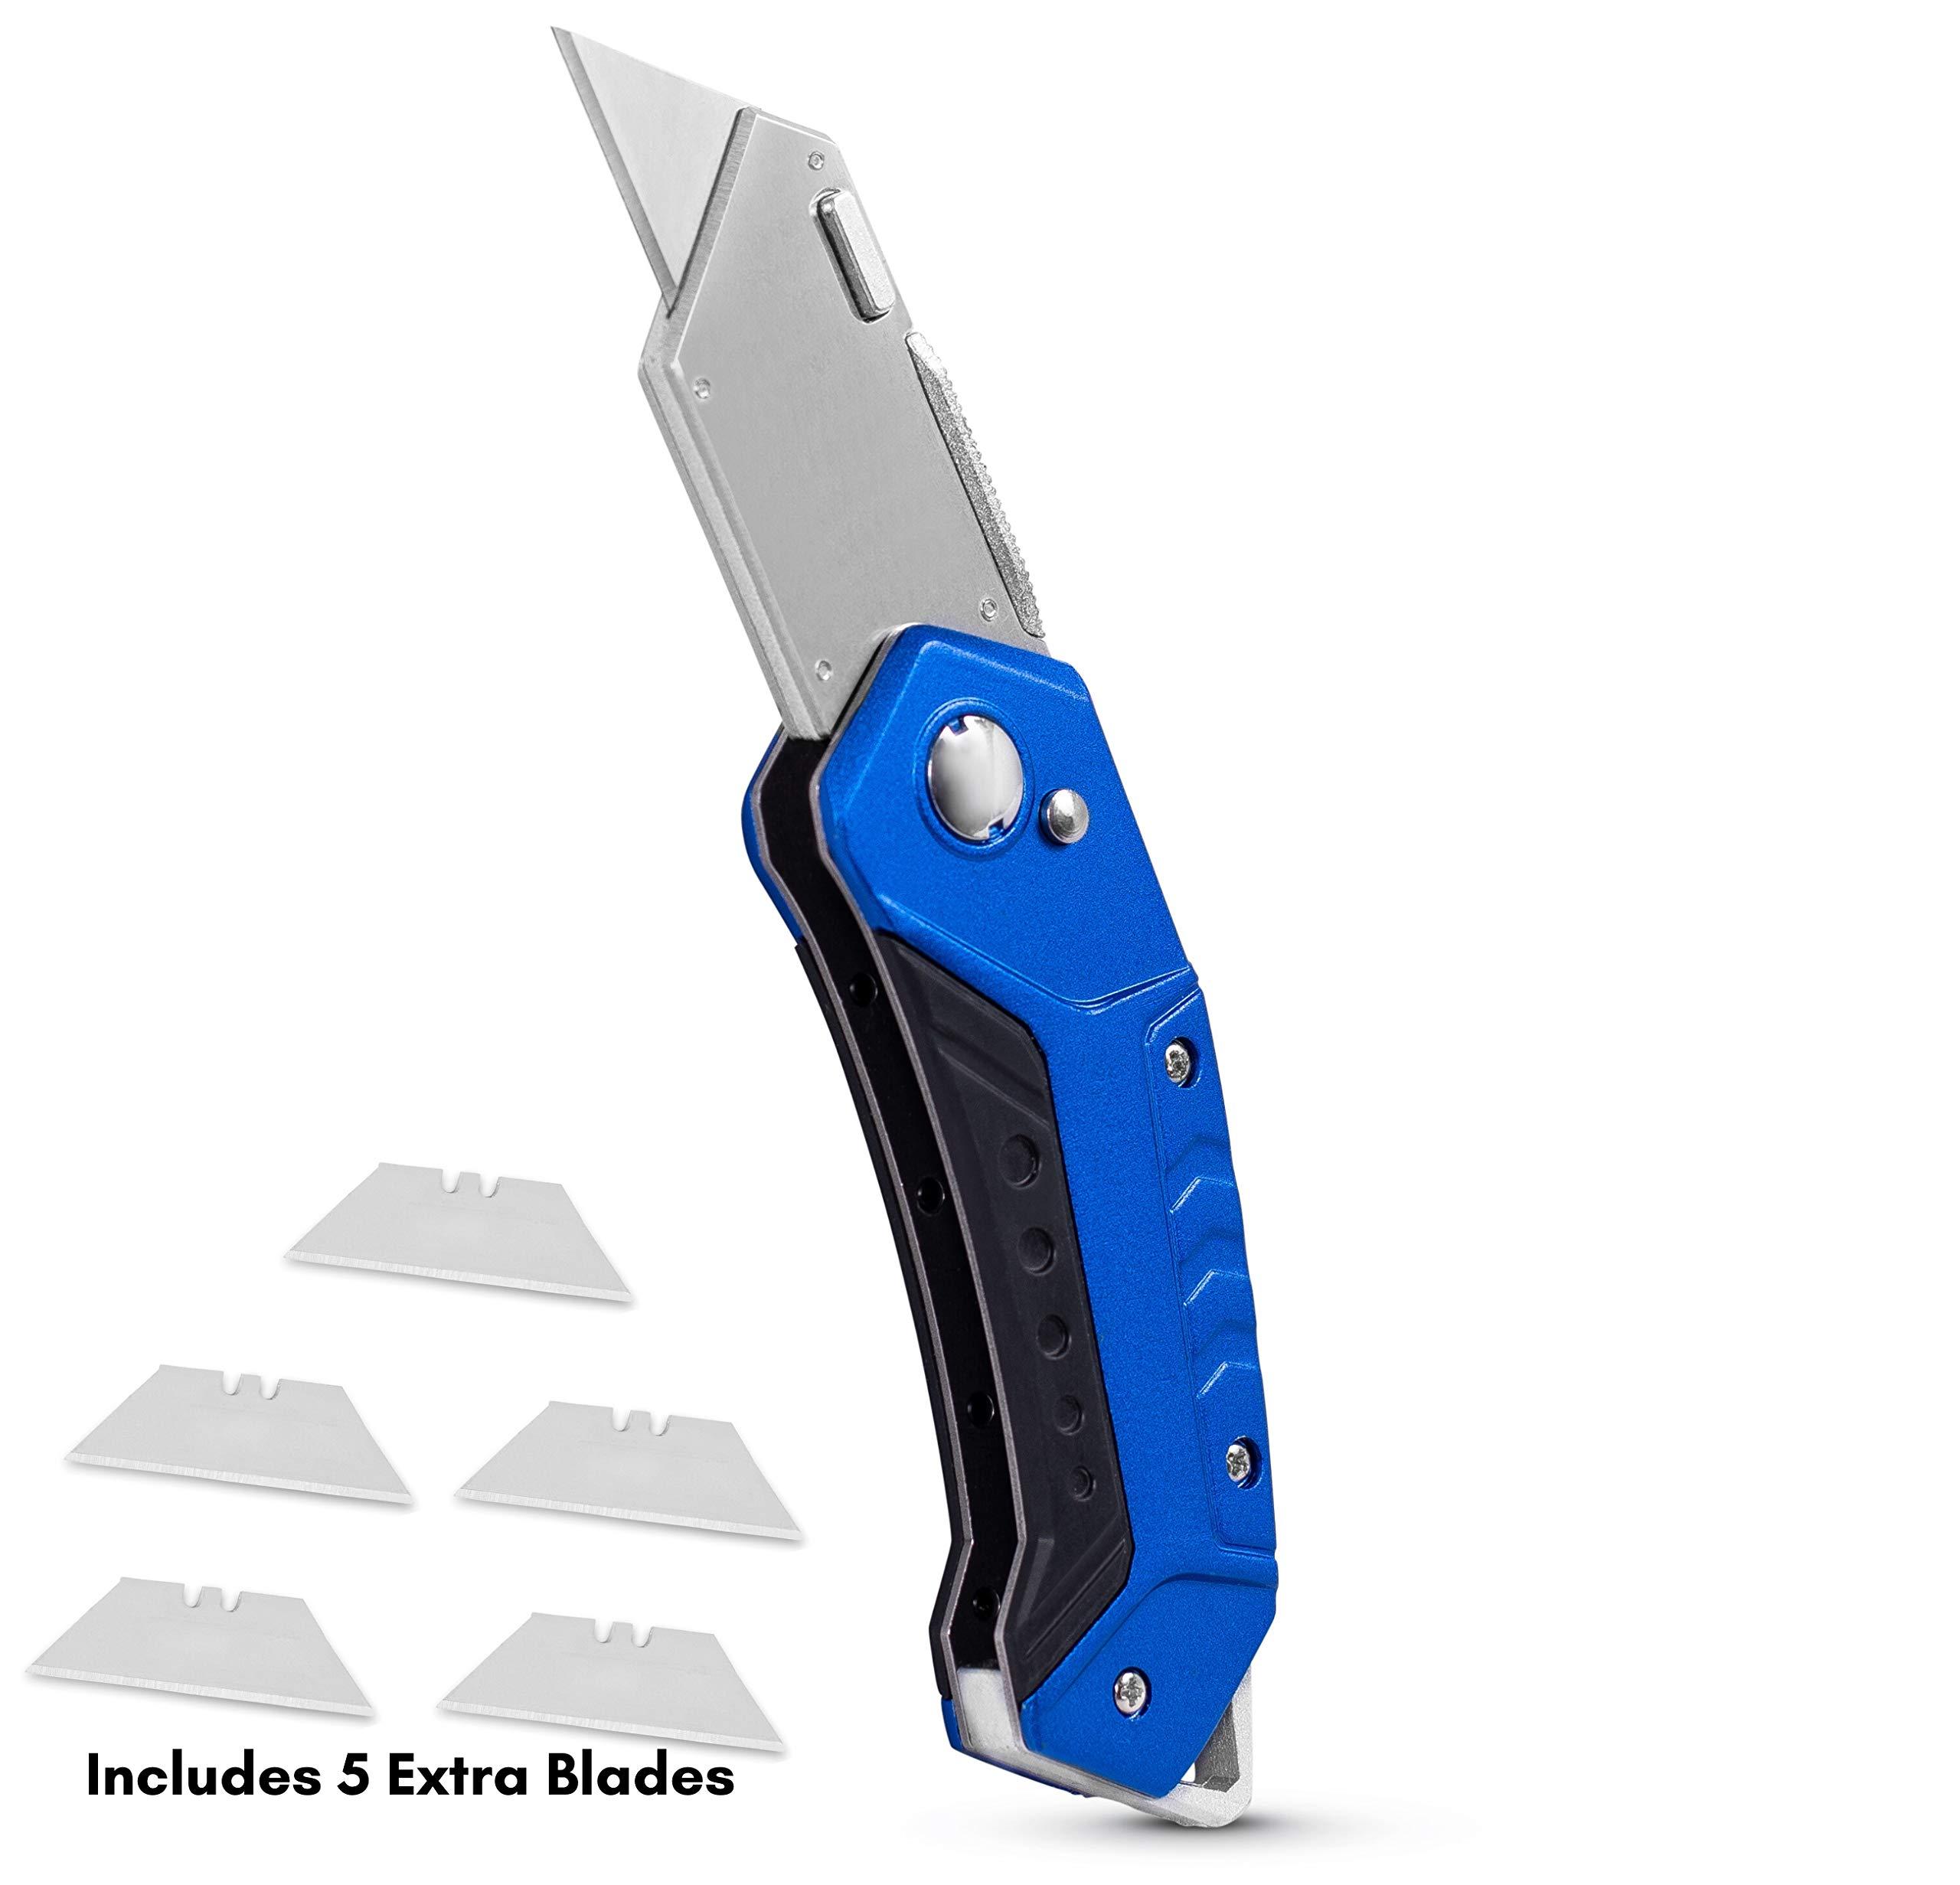 BirdRock Home Premium Folding Utility Knife – Small Compact Pocket – Folding Box Cutter Tool – 5 Extra Razor Blades – Cut Cardboard Boxes – Locking Safety Knife Set – Heavy Duty Aluminum Body